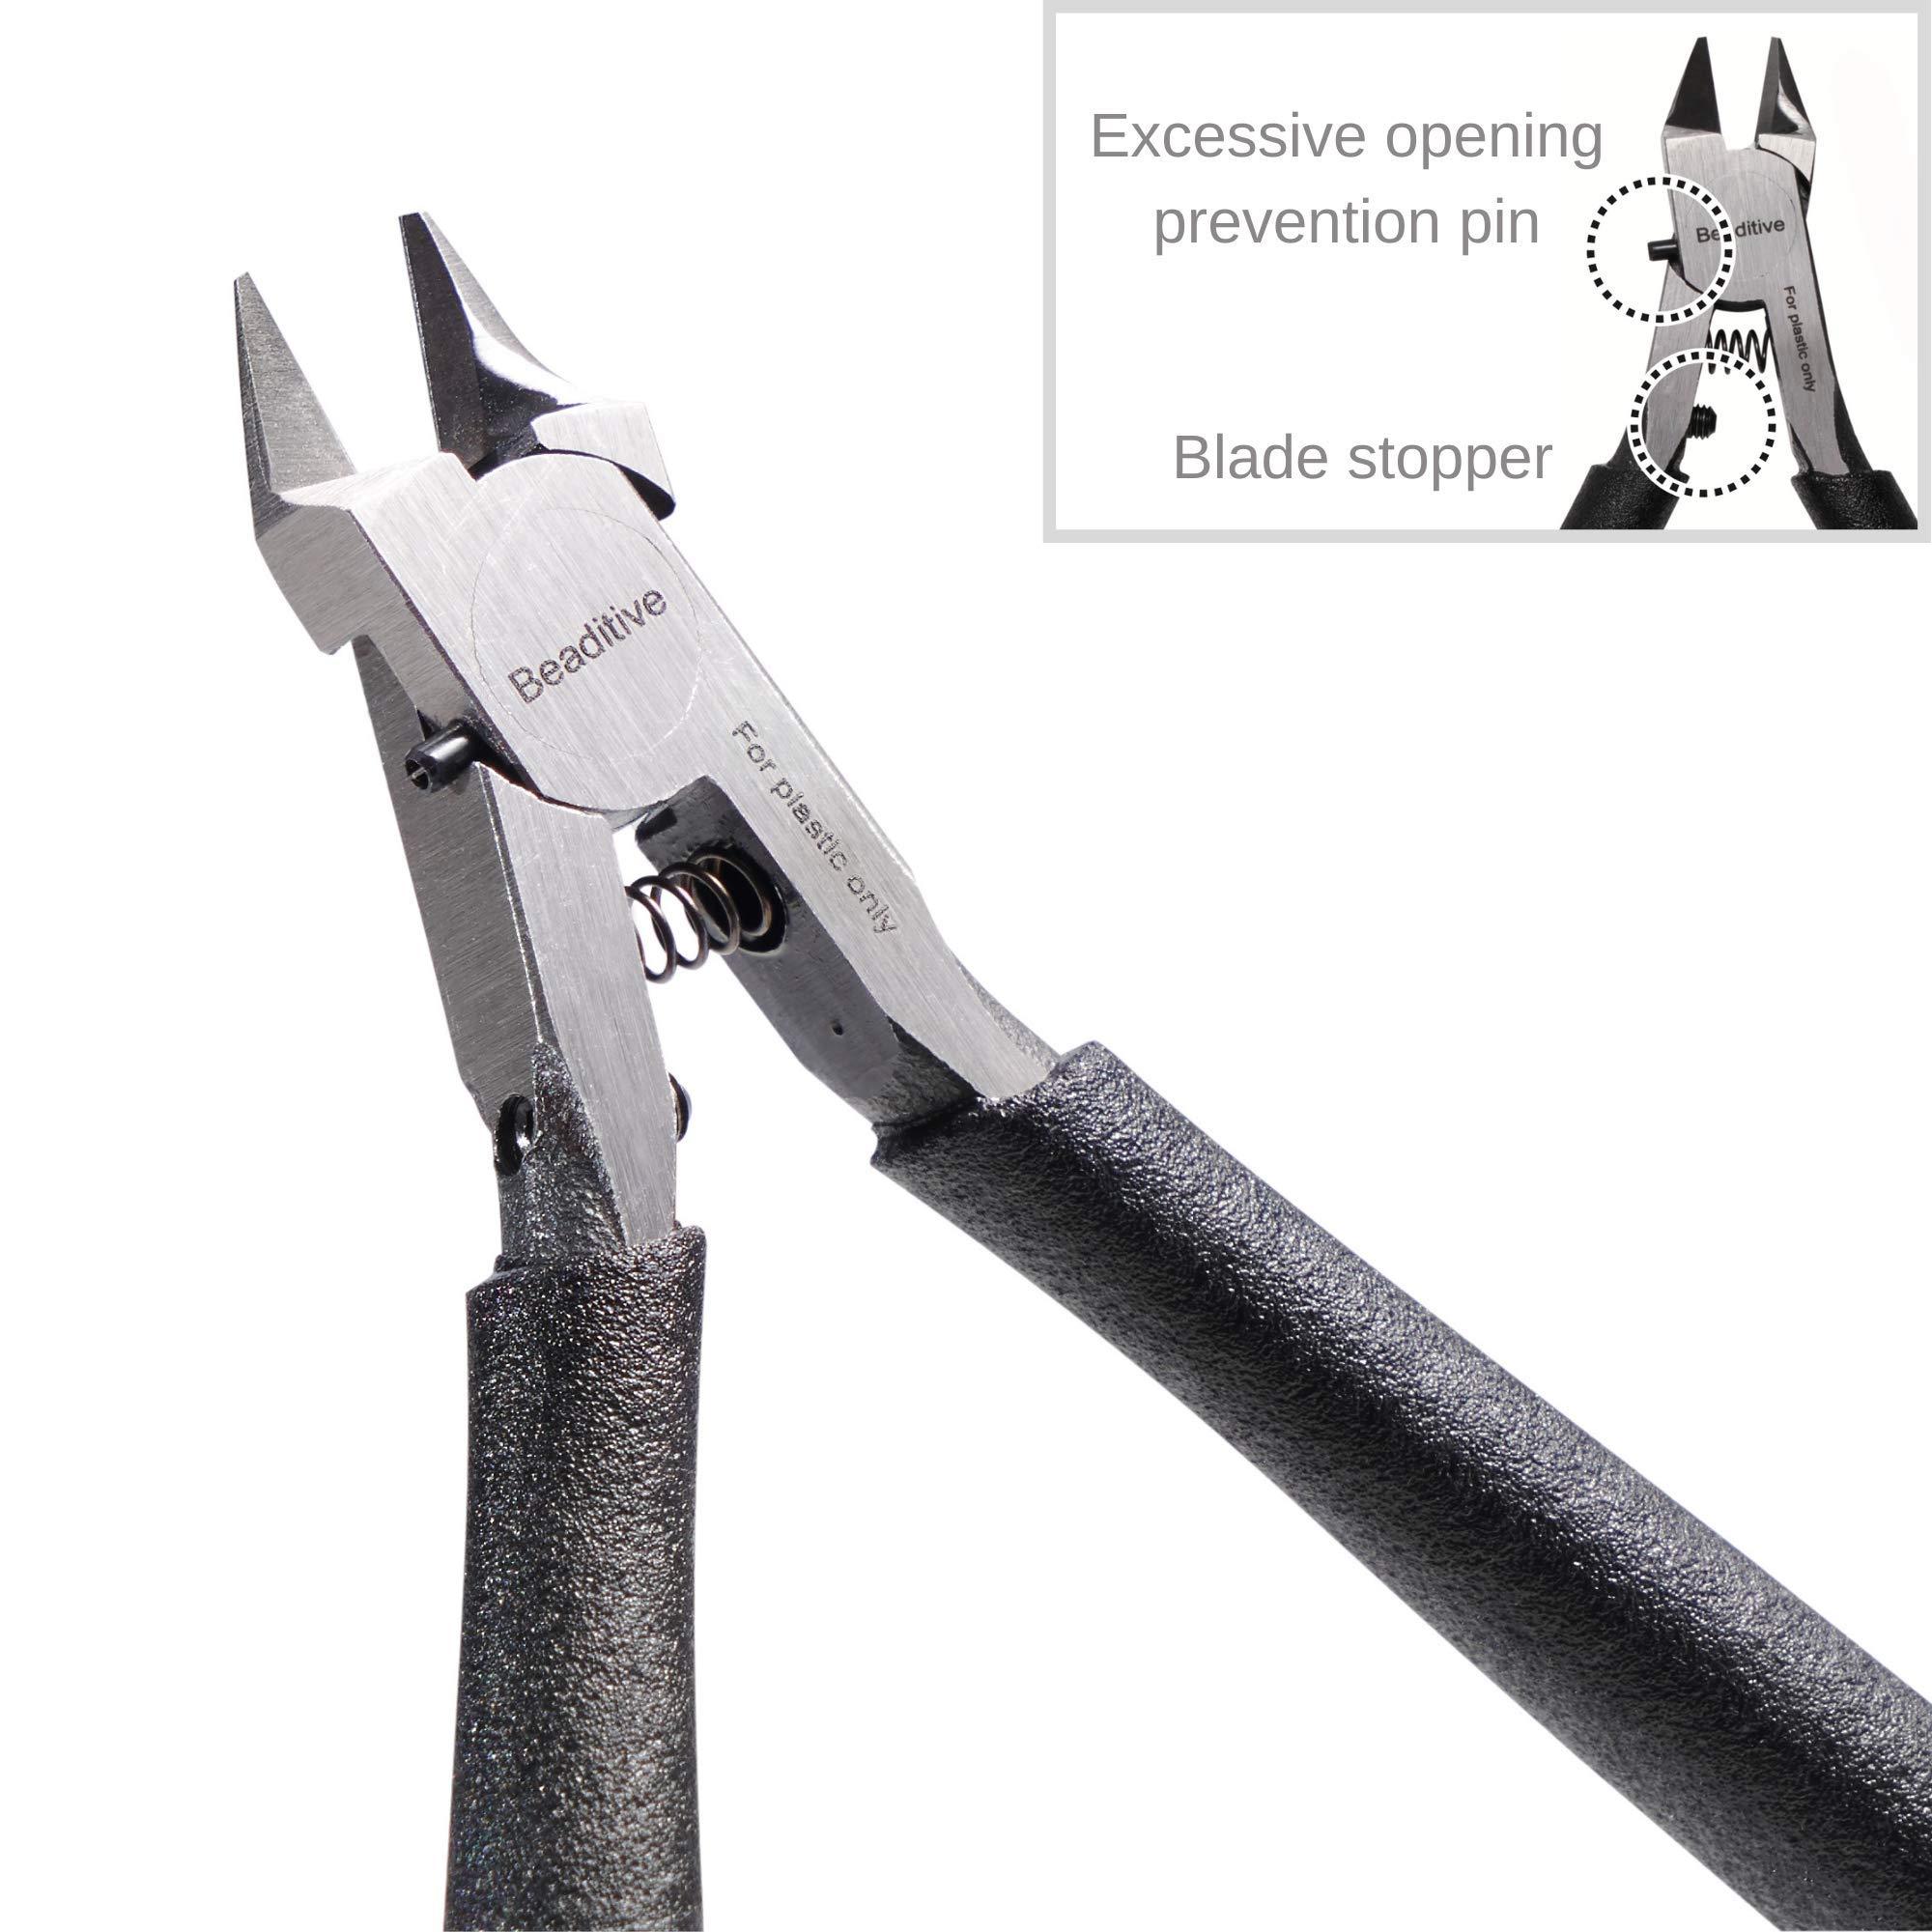 Beaditive Single Blade Nipper, Plastic Sprue Cutter